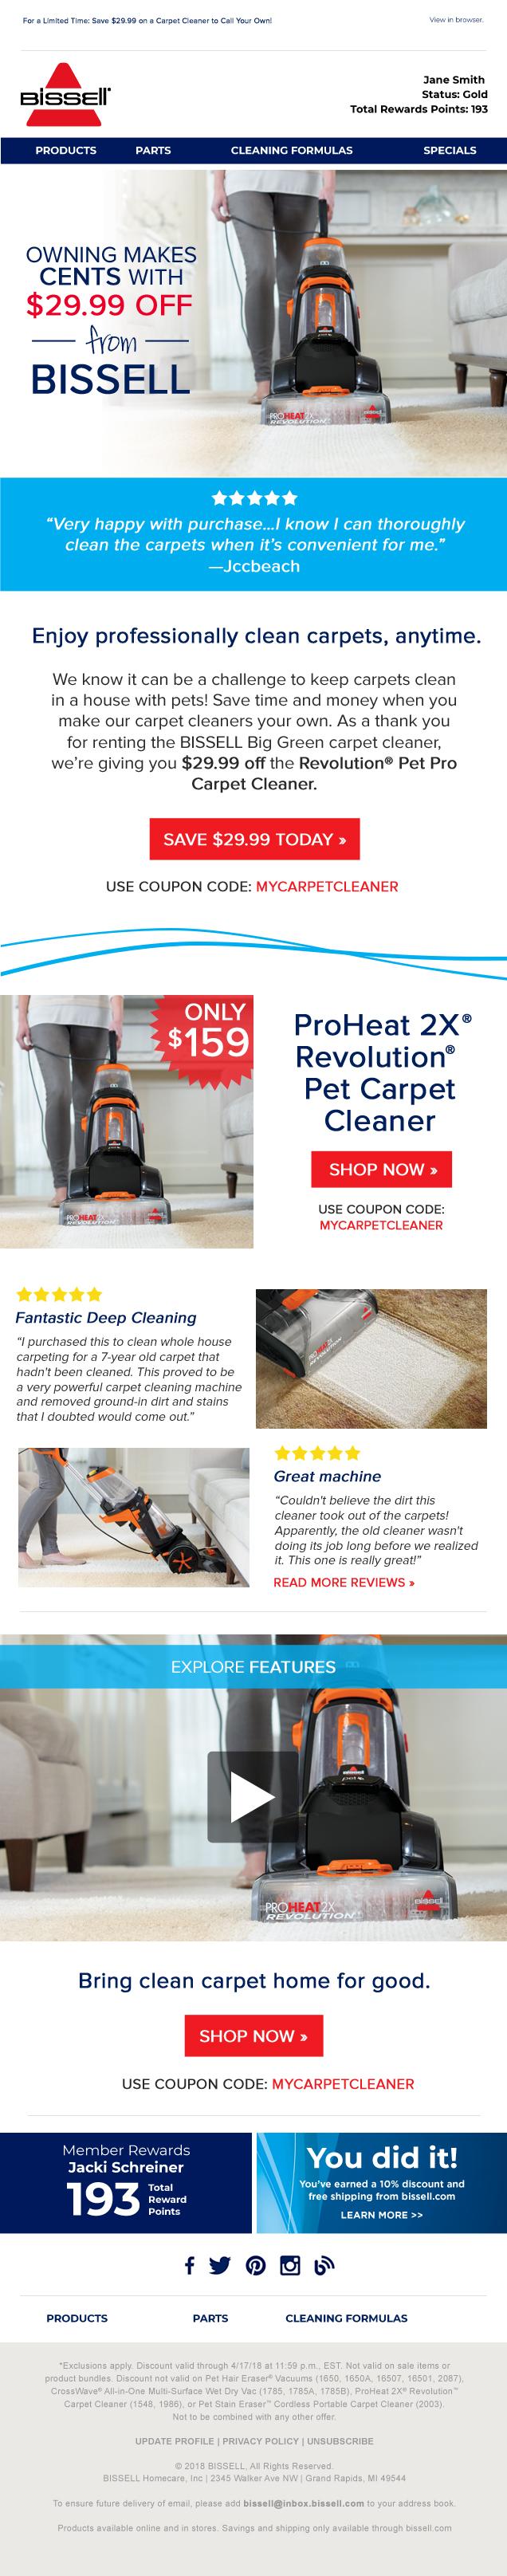 BISSELL Pet Carpet Cleaner Responsive Email Design